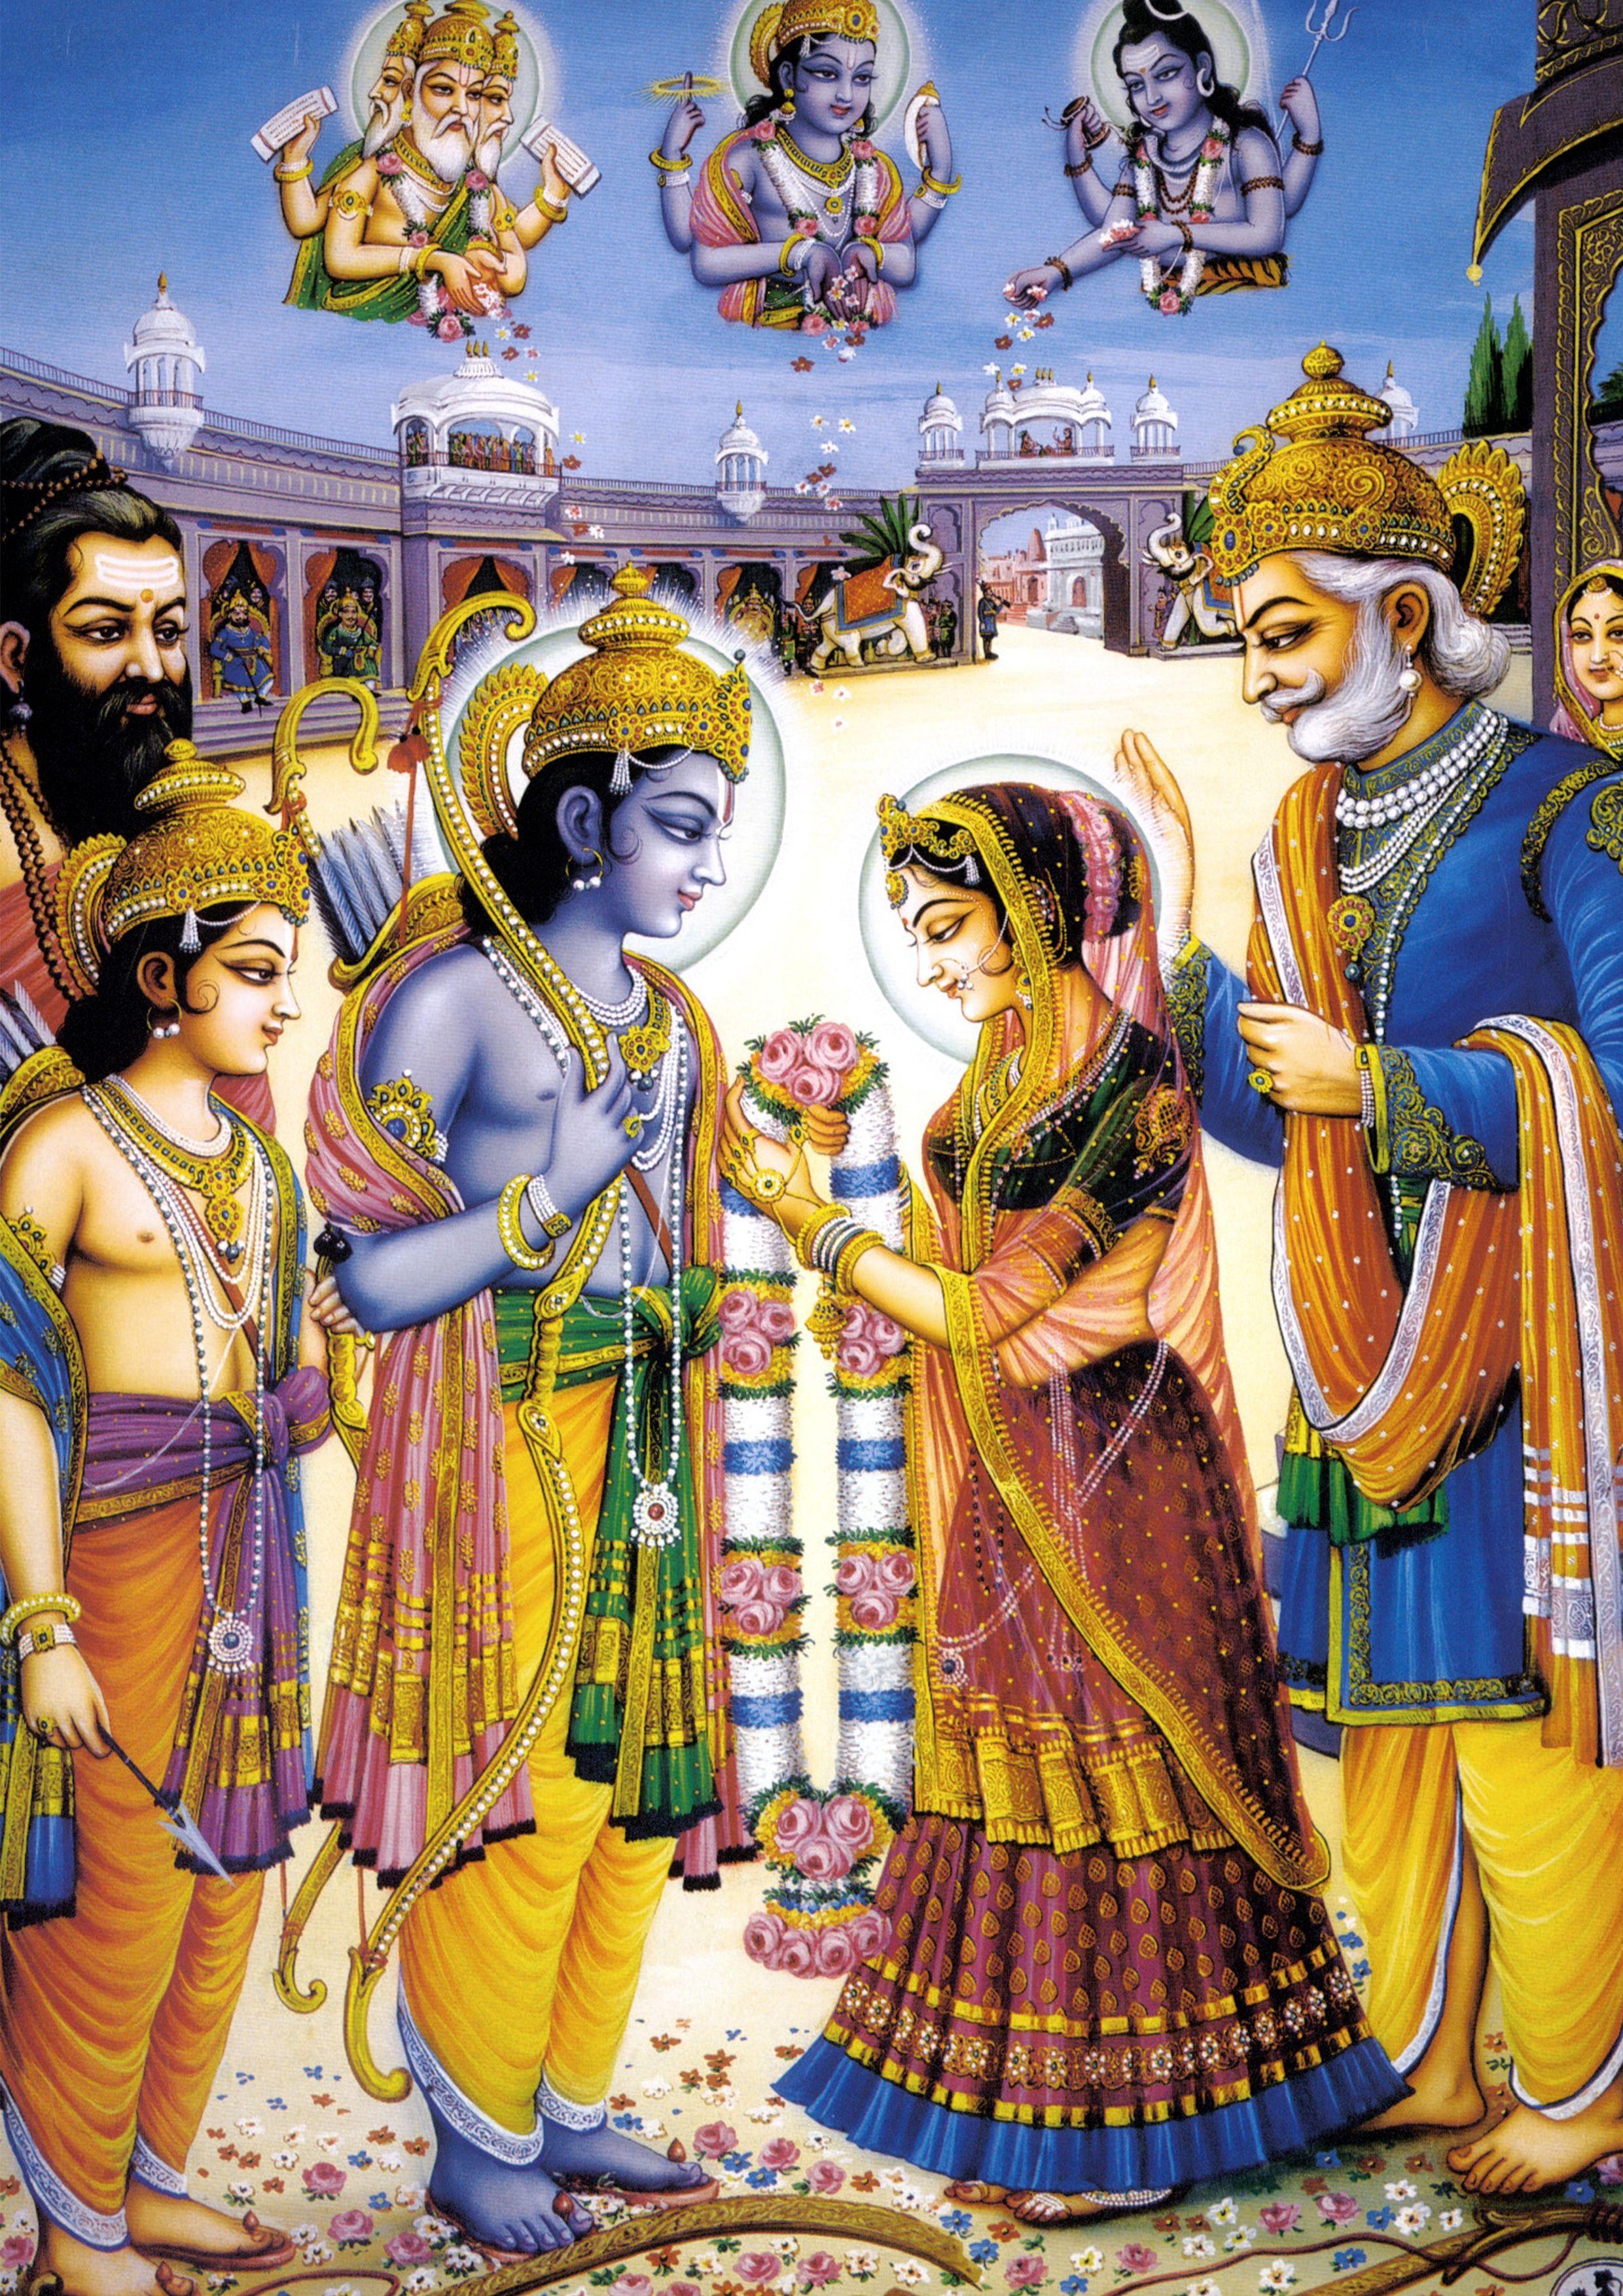 Shiv Parvati Vivah Hd Wallpaper Sitaram God In 2019 Pinterest Sri Rama Lord Krishna